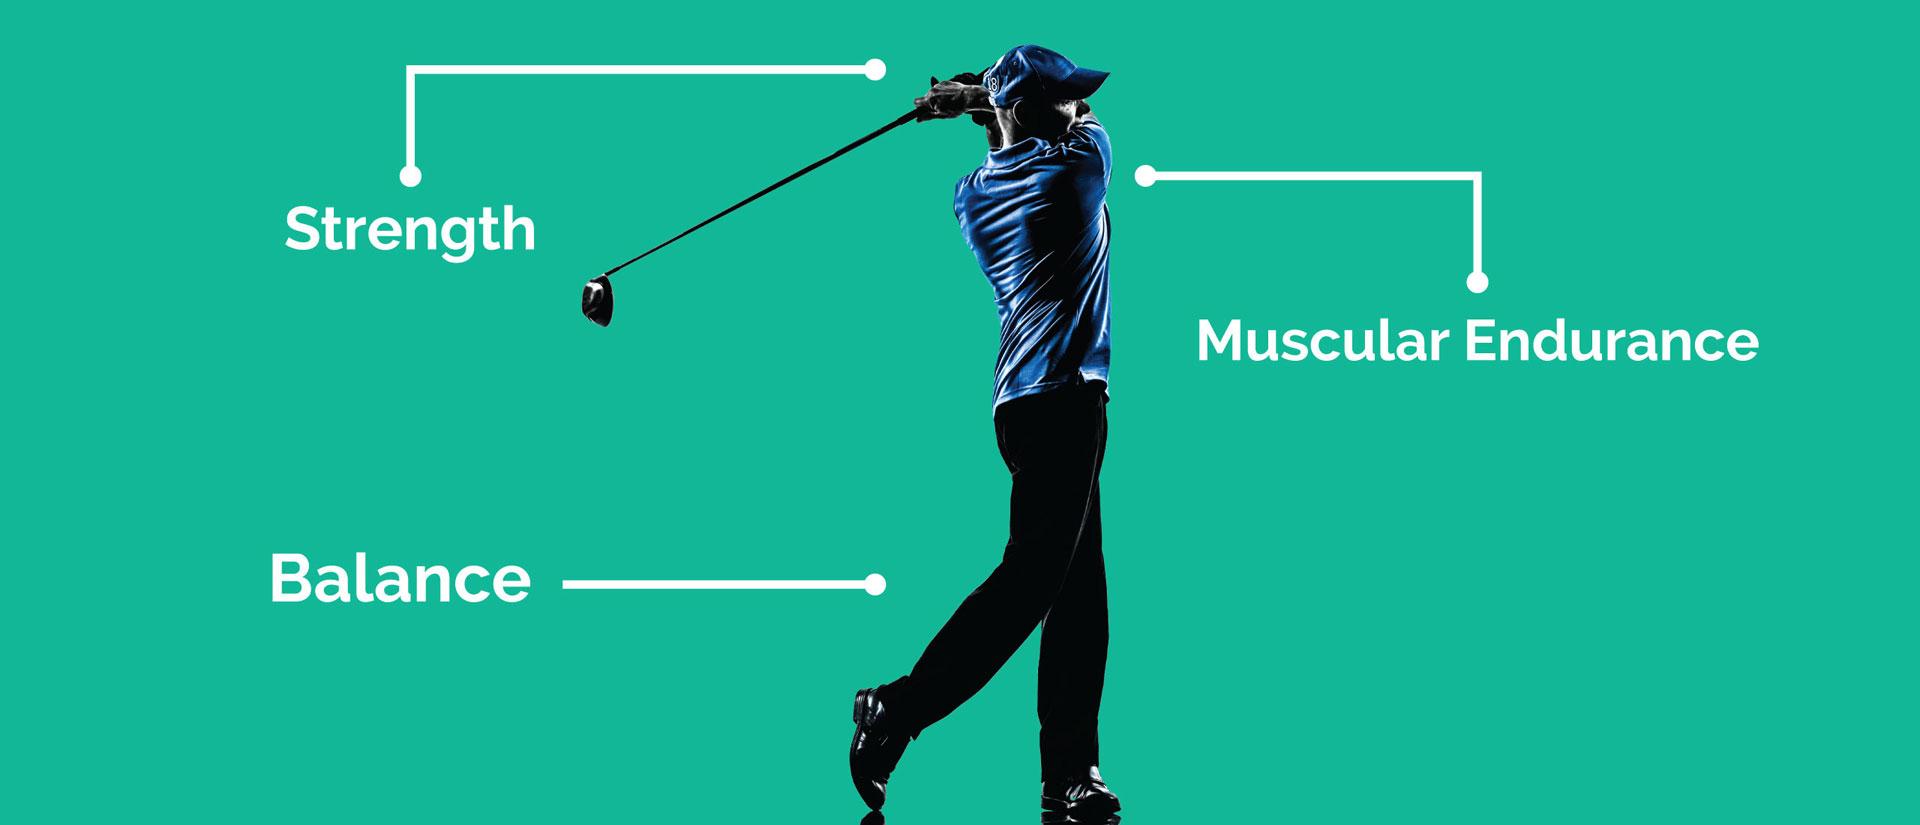 golf idaho fitness academy